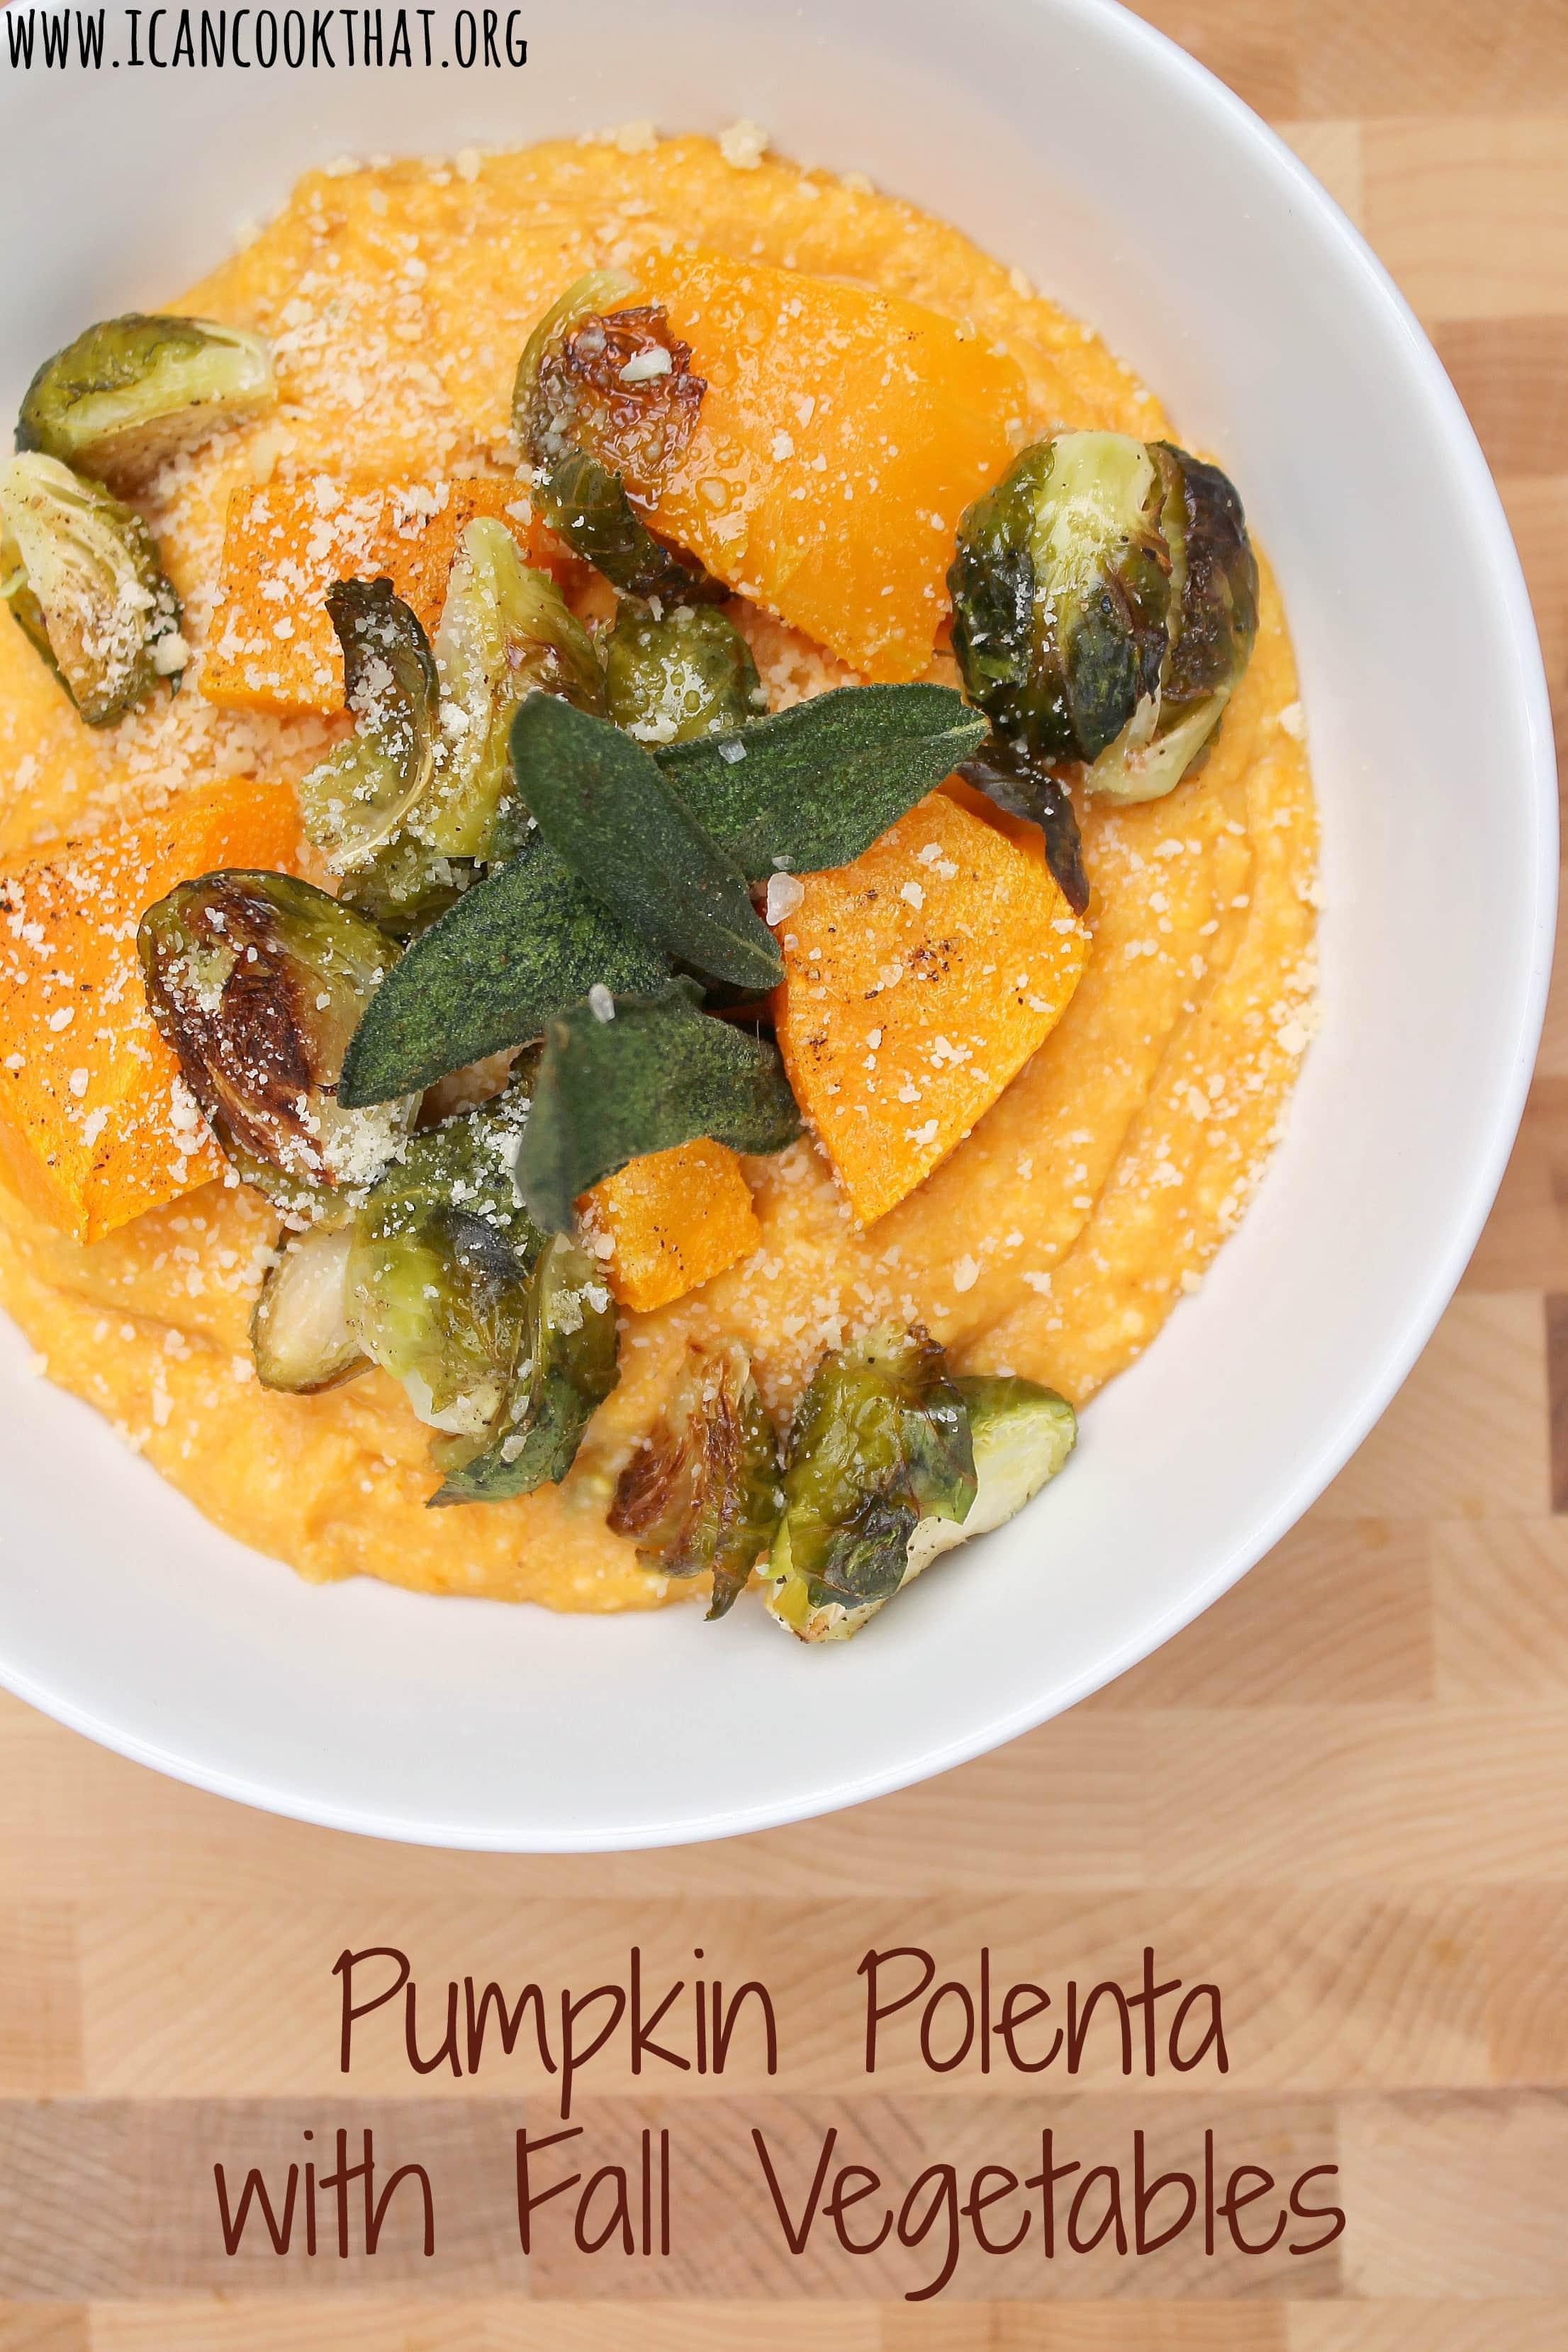 Pumpkin Polenta with Fall Vegetables